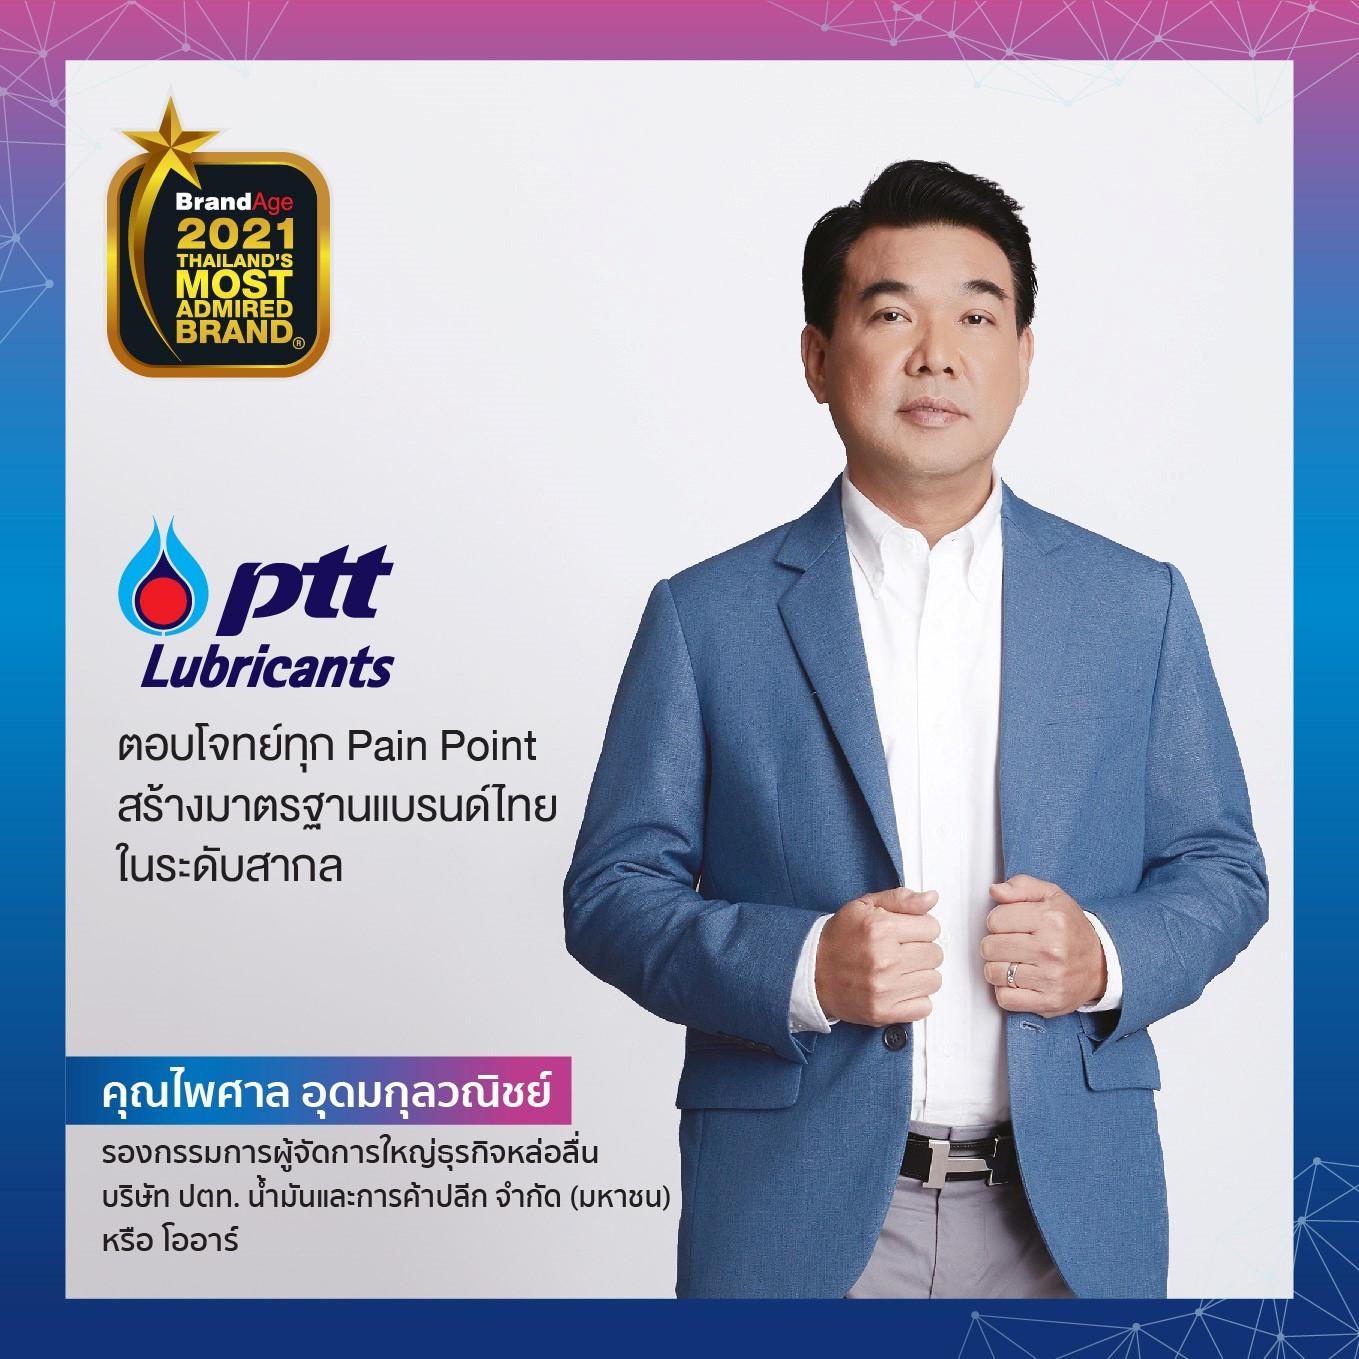 PTT Lubricants ได้รับรางวัลพิเศษ Thai Brand Award